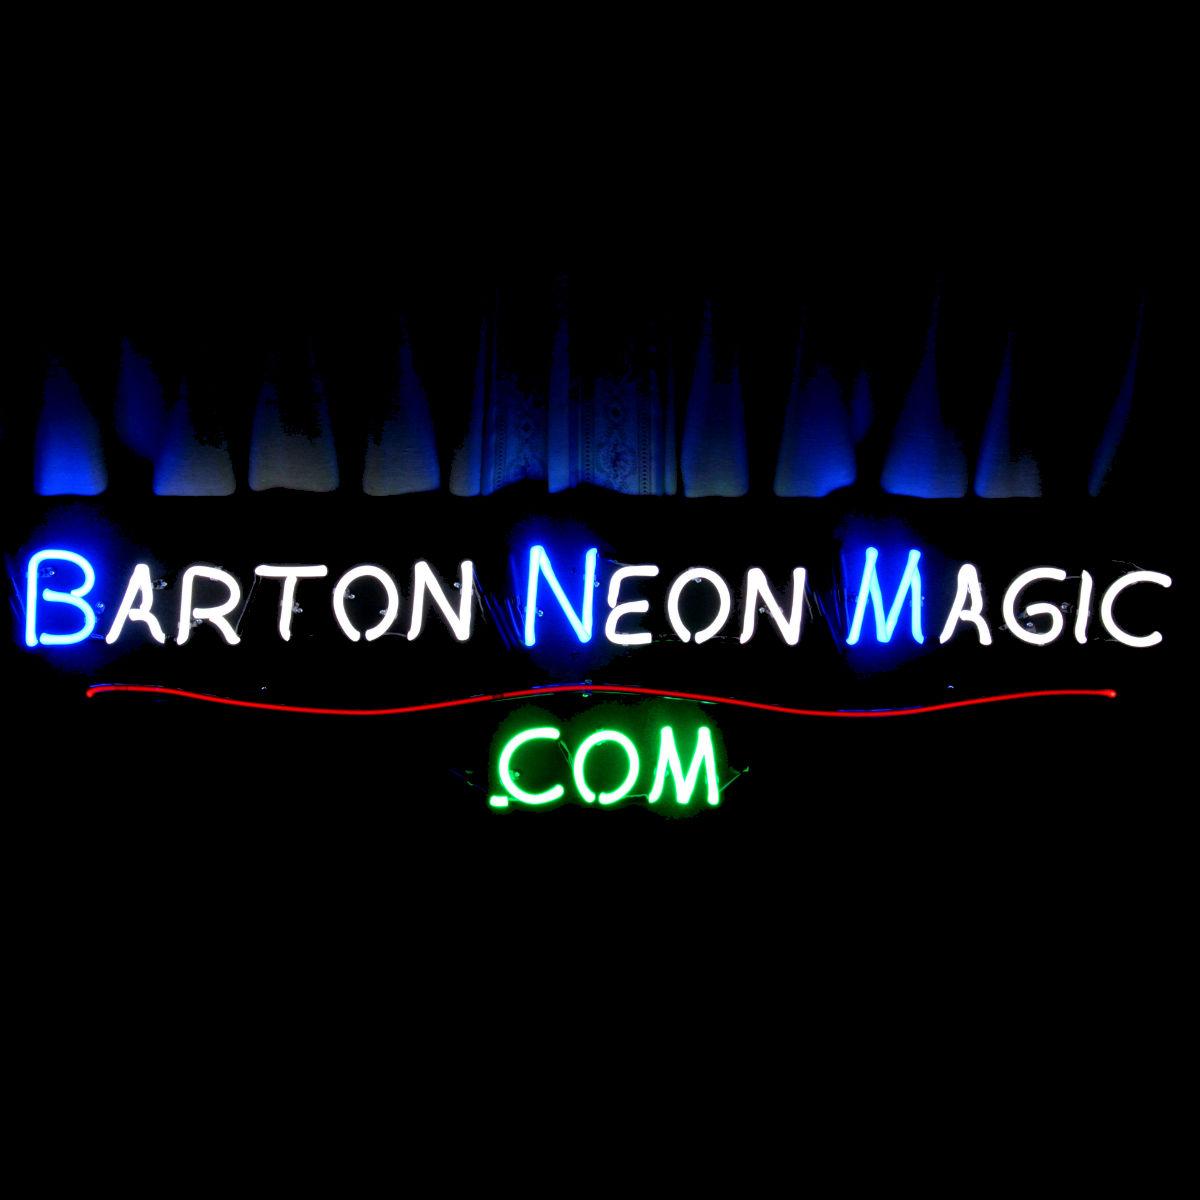 NEON ART by John Barton - BartonNeonMagic.com